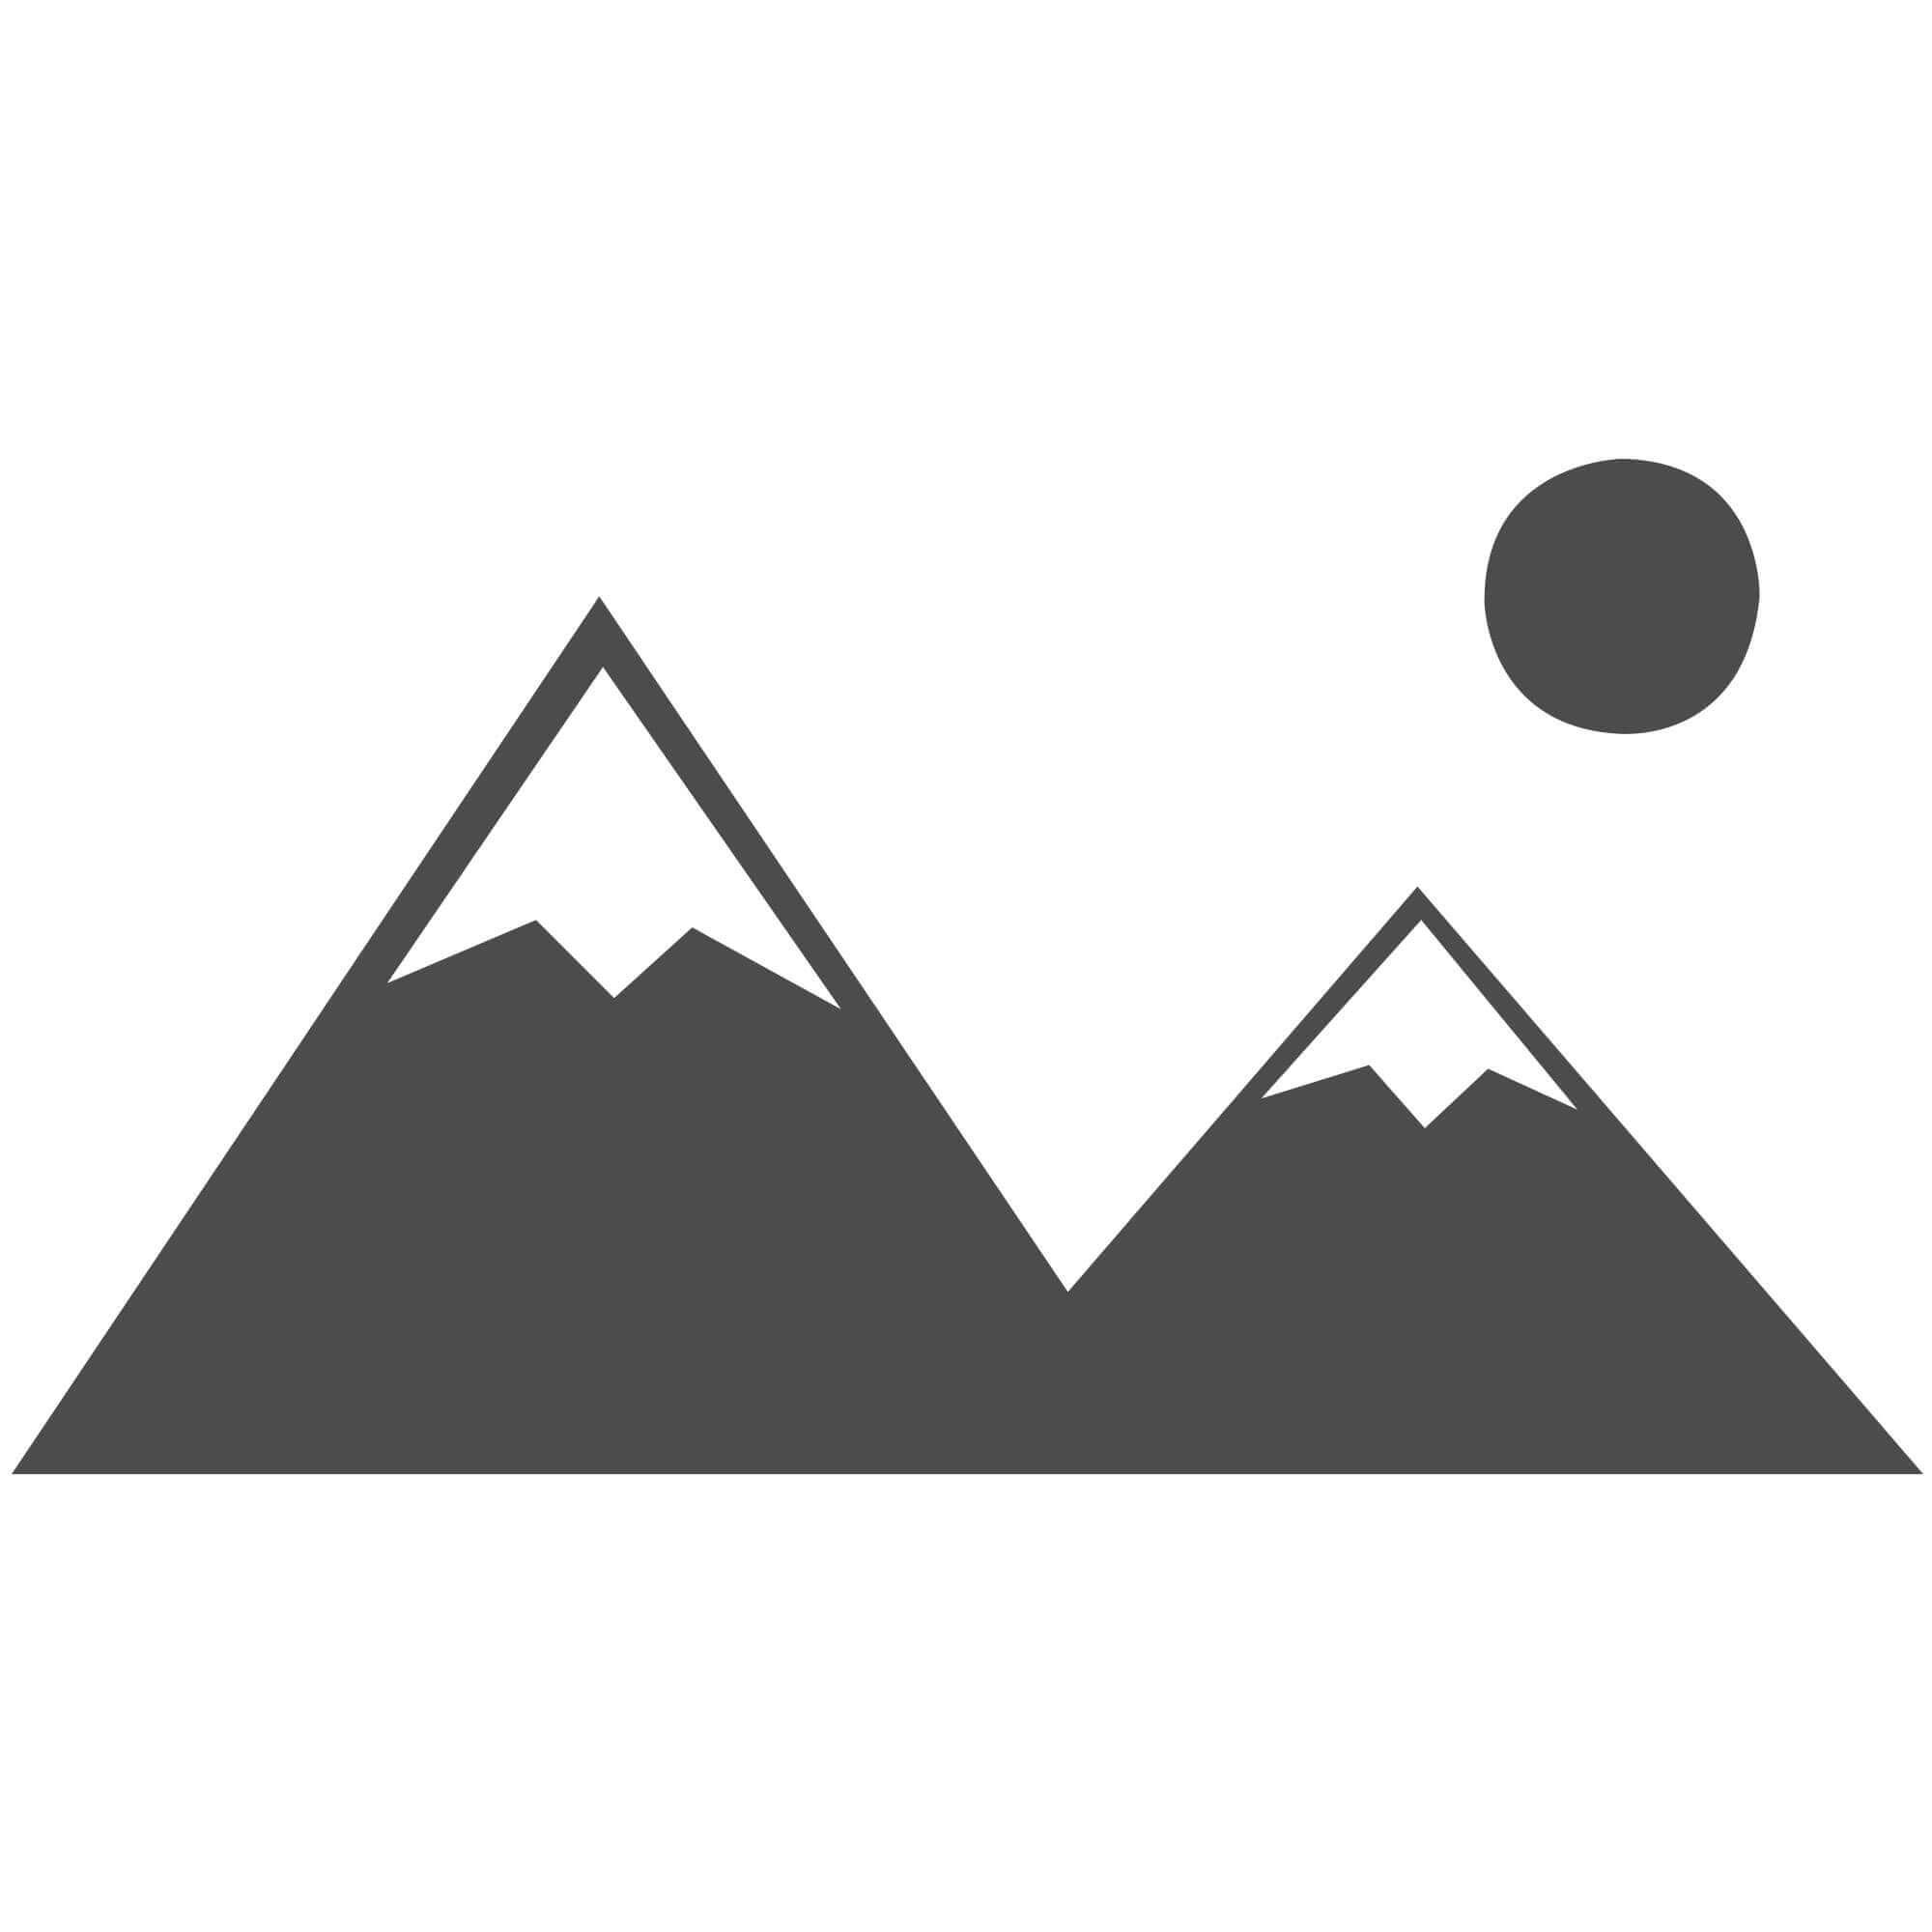 "Pearl Shaggy Gold Rug - Size 160 x 230 cm (5'3"" x 7'7"")"